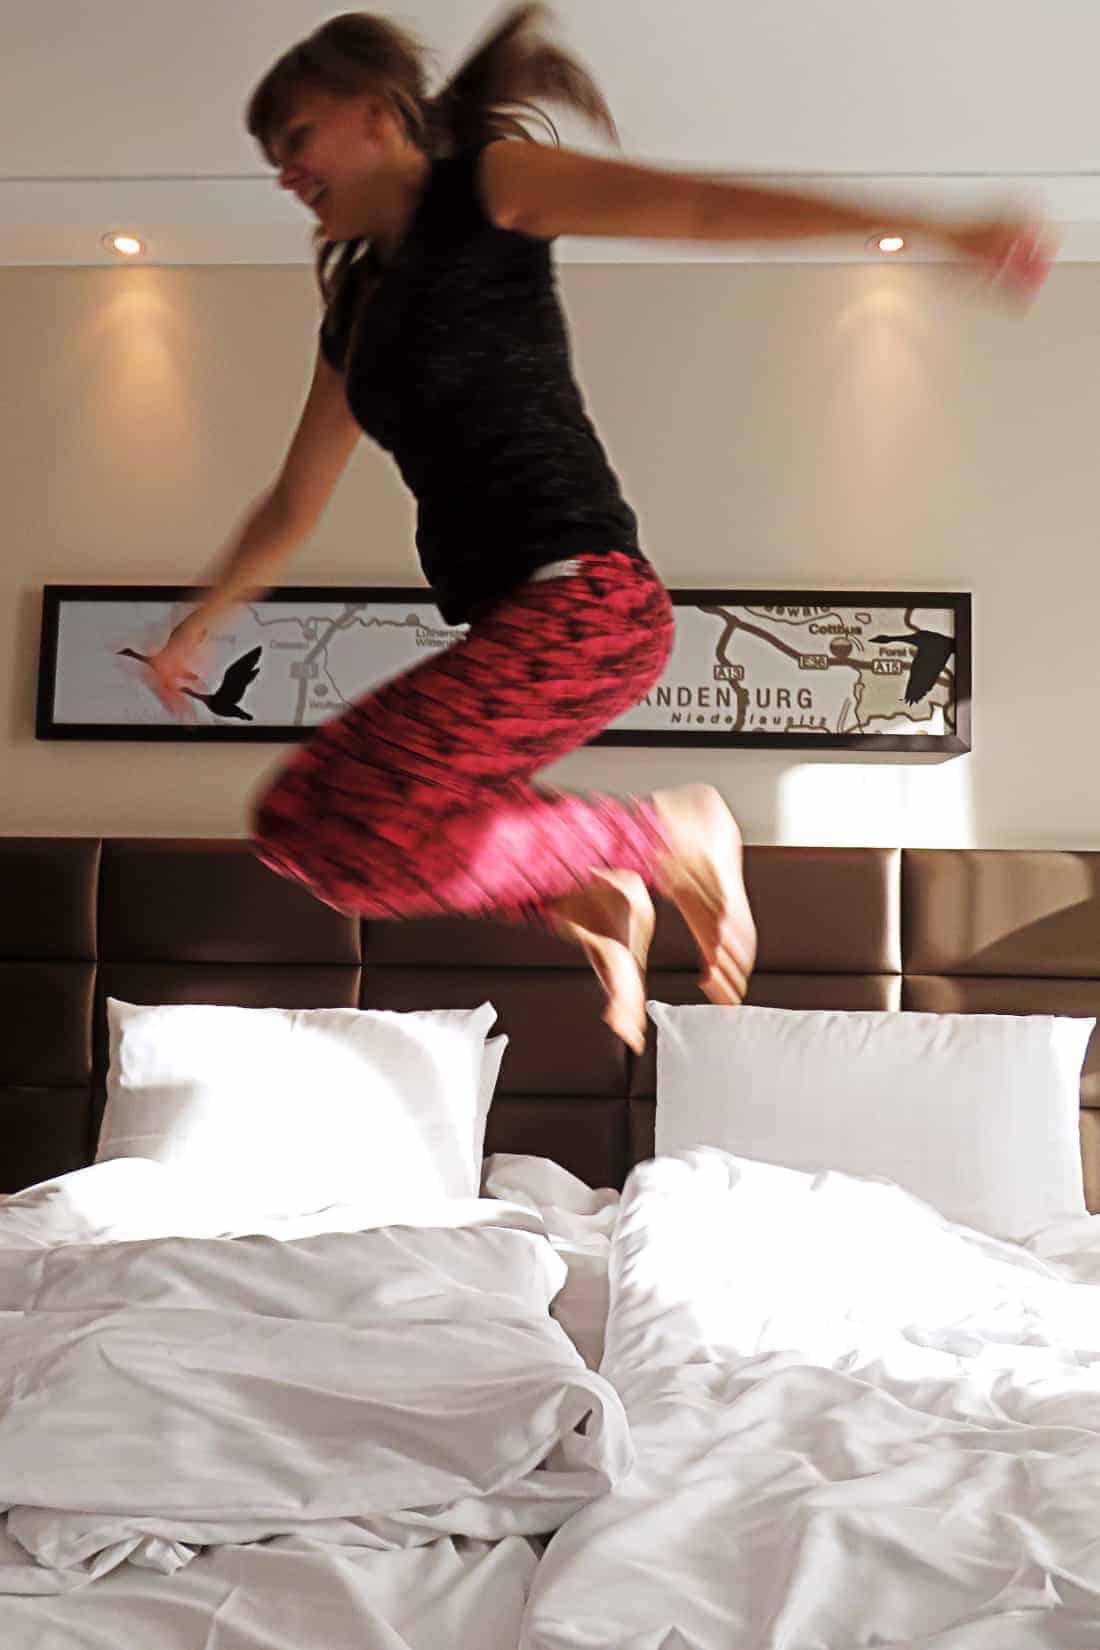 gogirlrun_holiday-inn_laufevent_berlin-unterkunft-hotel-übernachten7